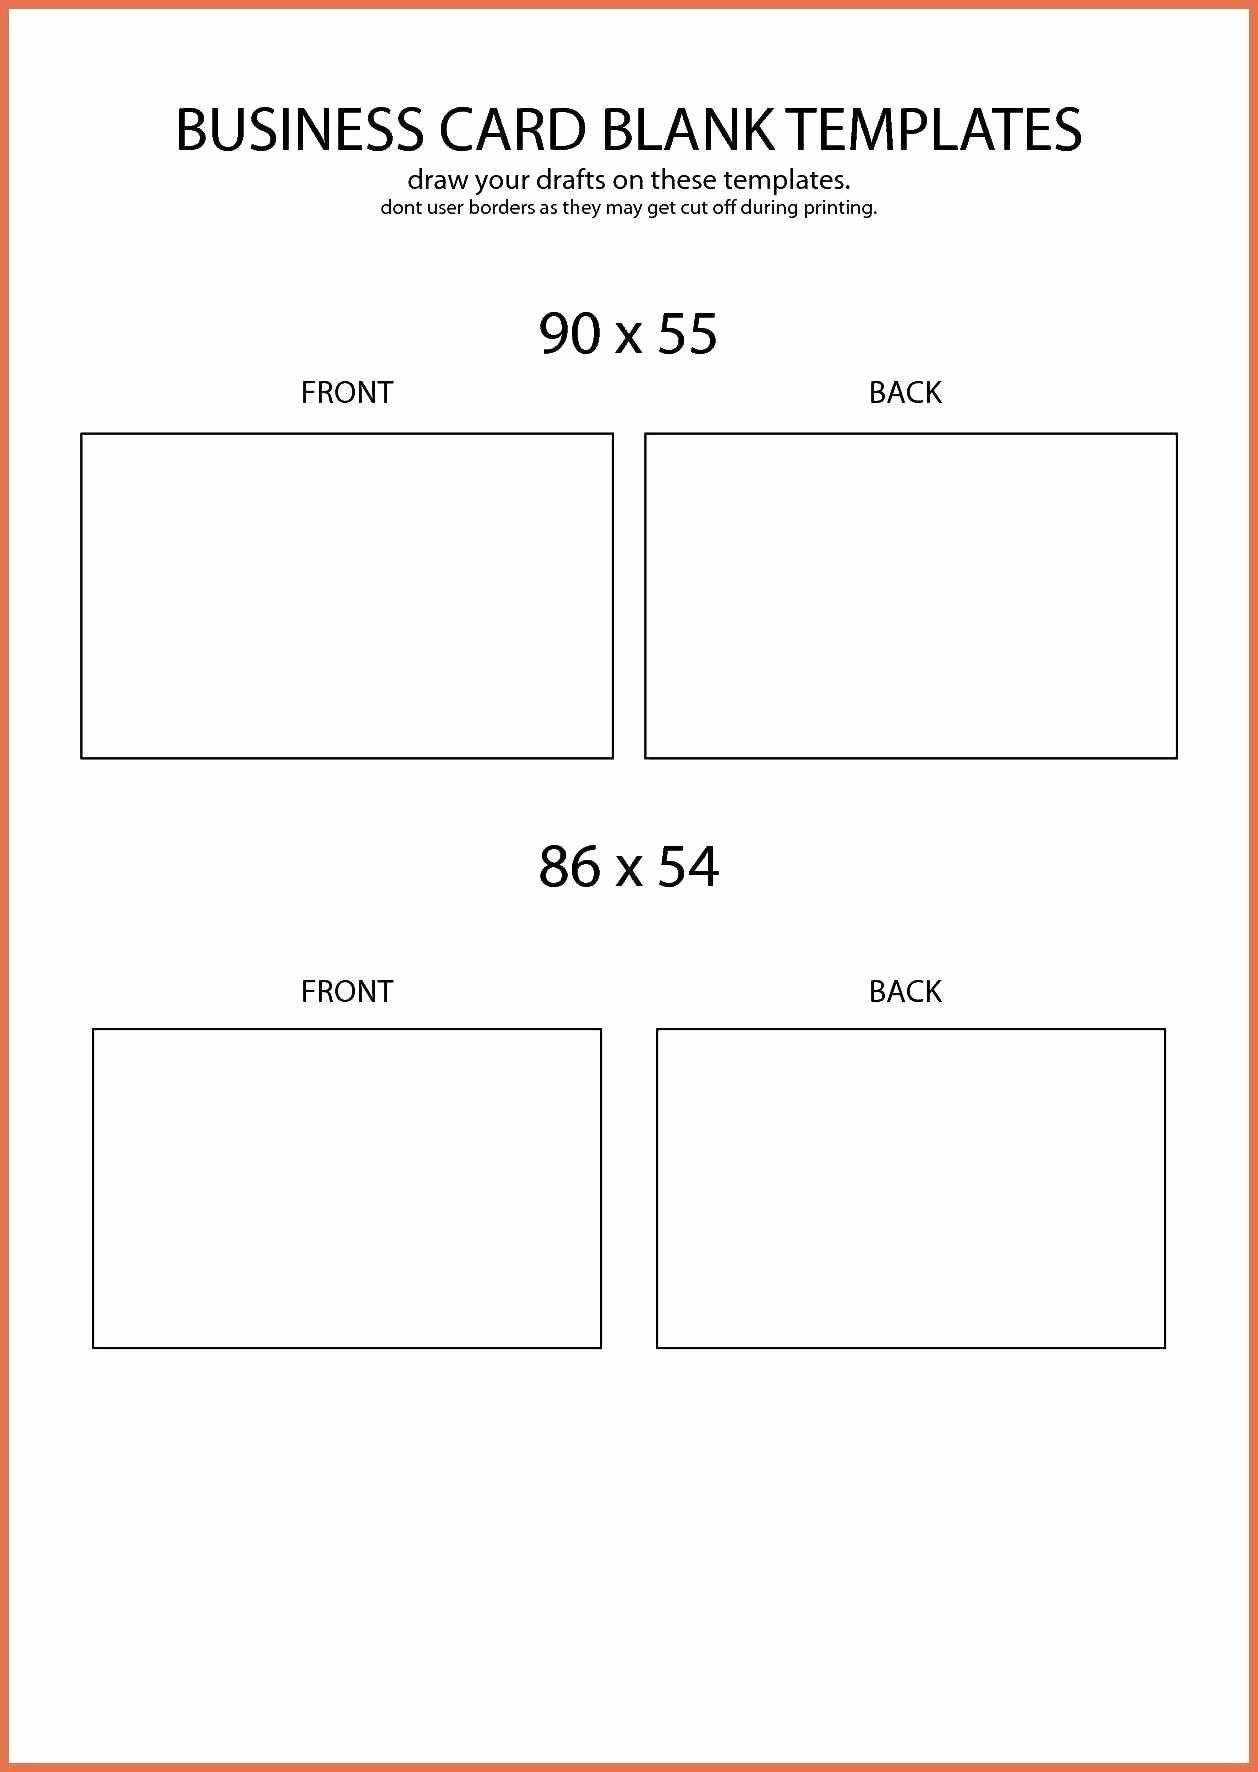 Design Templates Royal Brites Business Cards Word Template Printing For Blank Business Card Template Microsoft Word